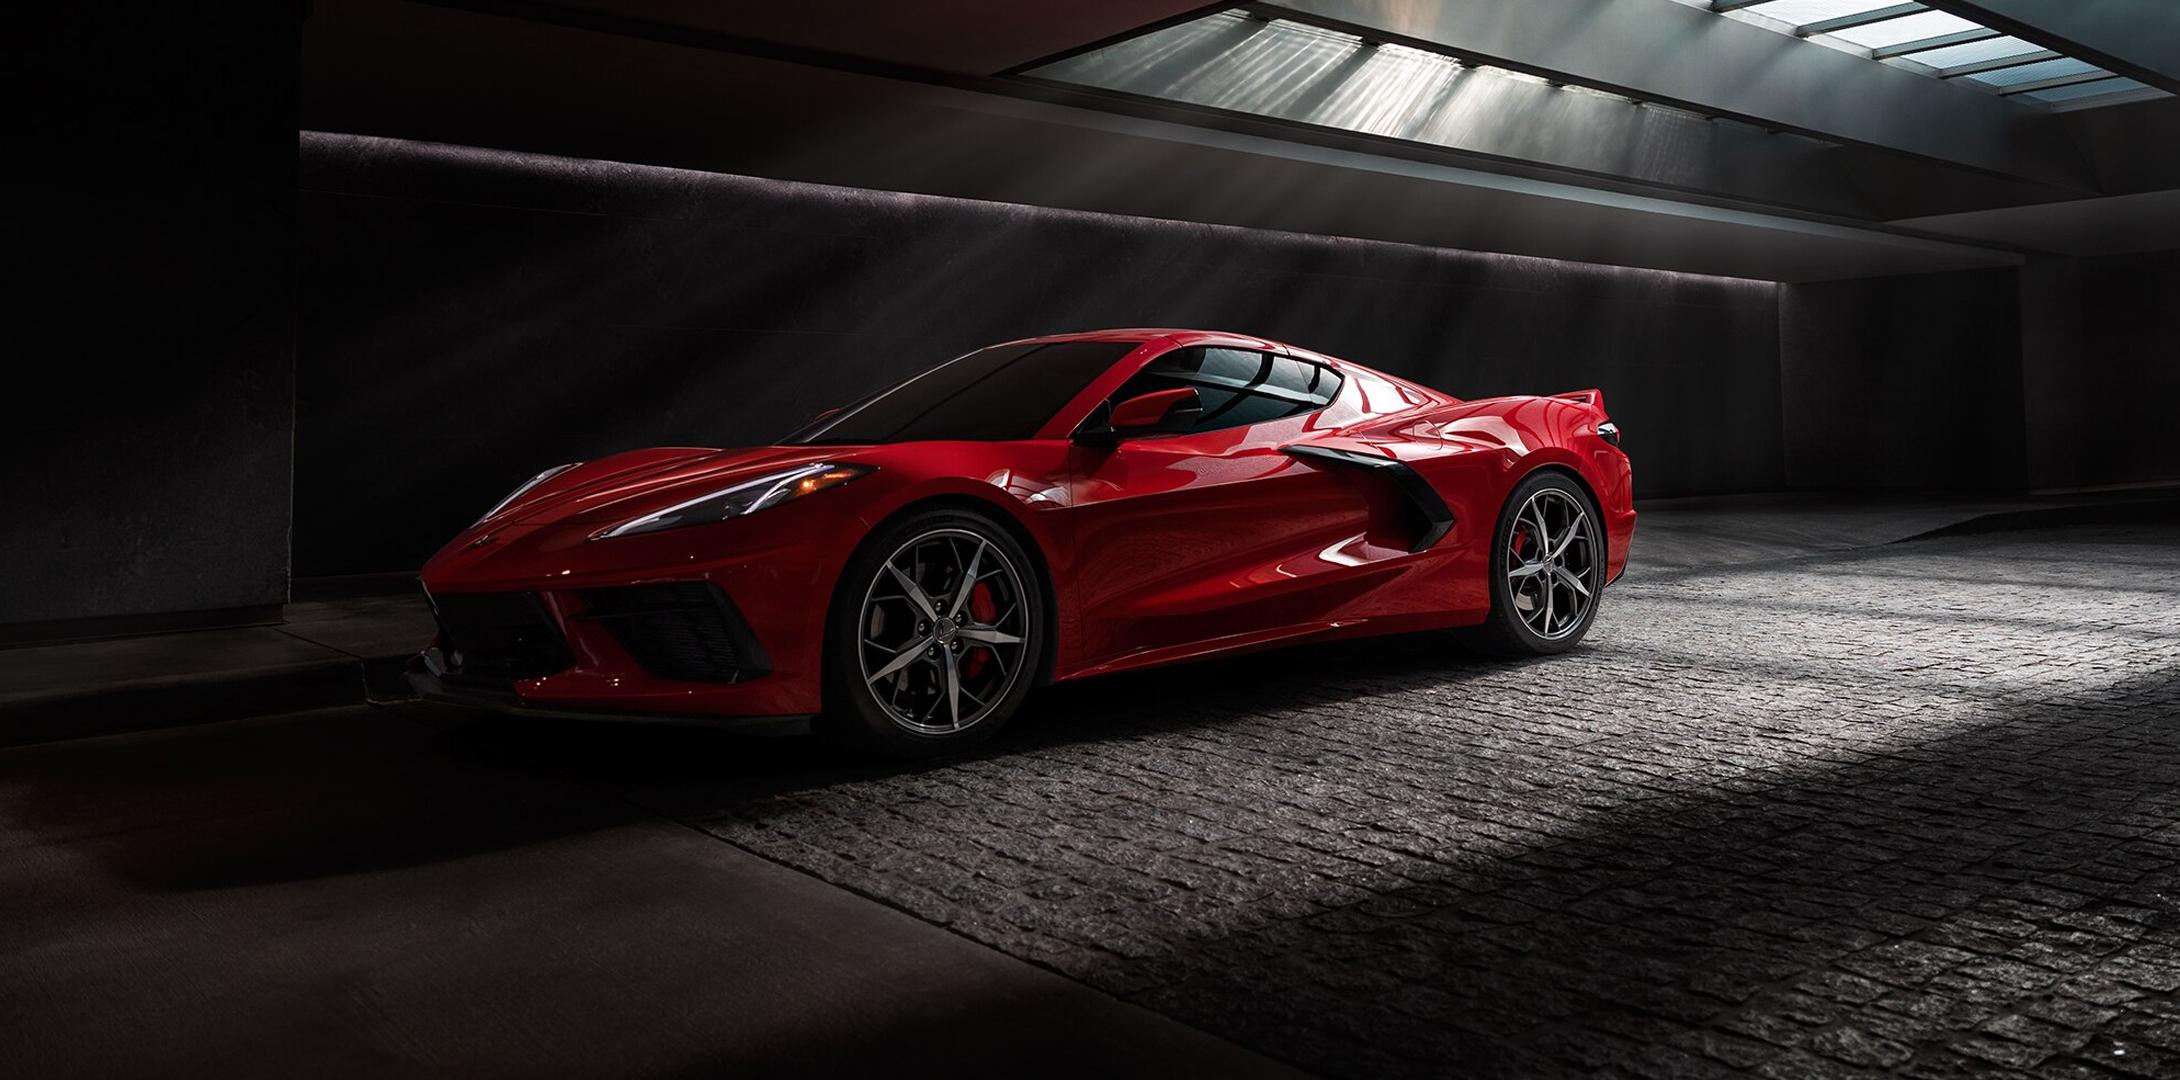 2020 Corvette Final Model Year Stats